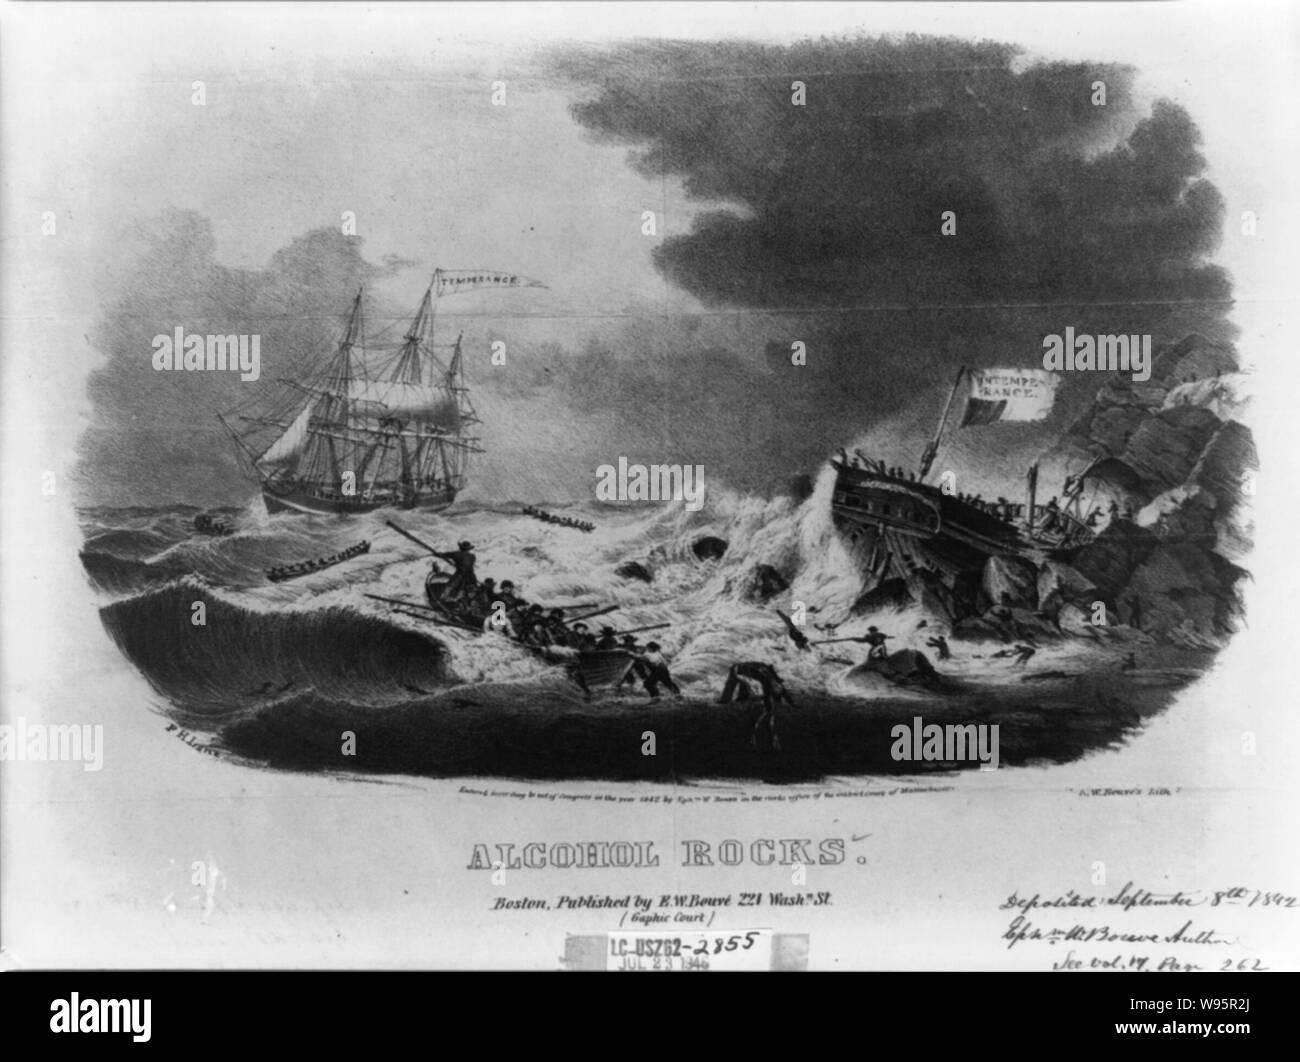 Rowboats Black and White Stock Photos & Images - Alamy